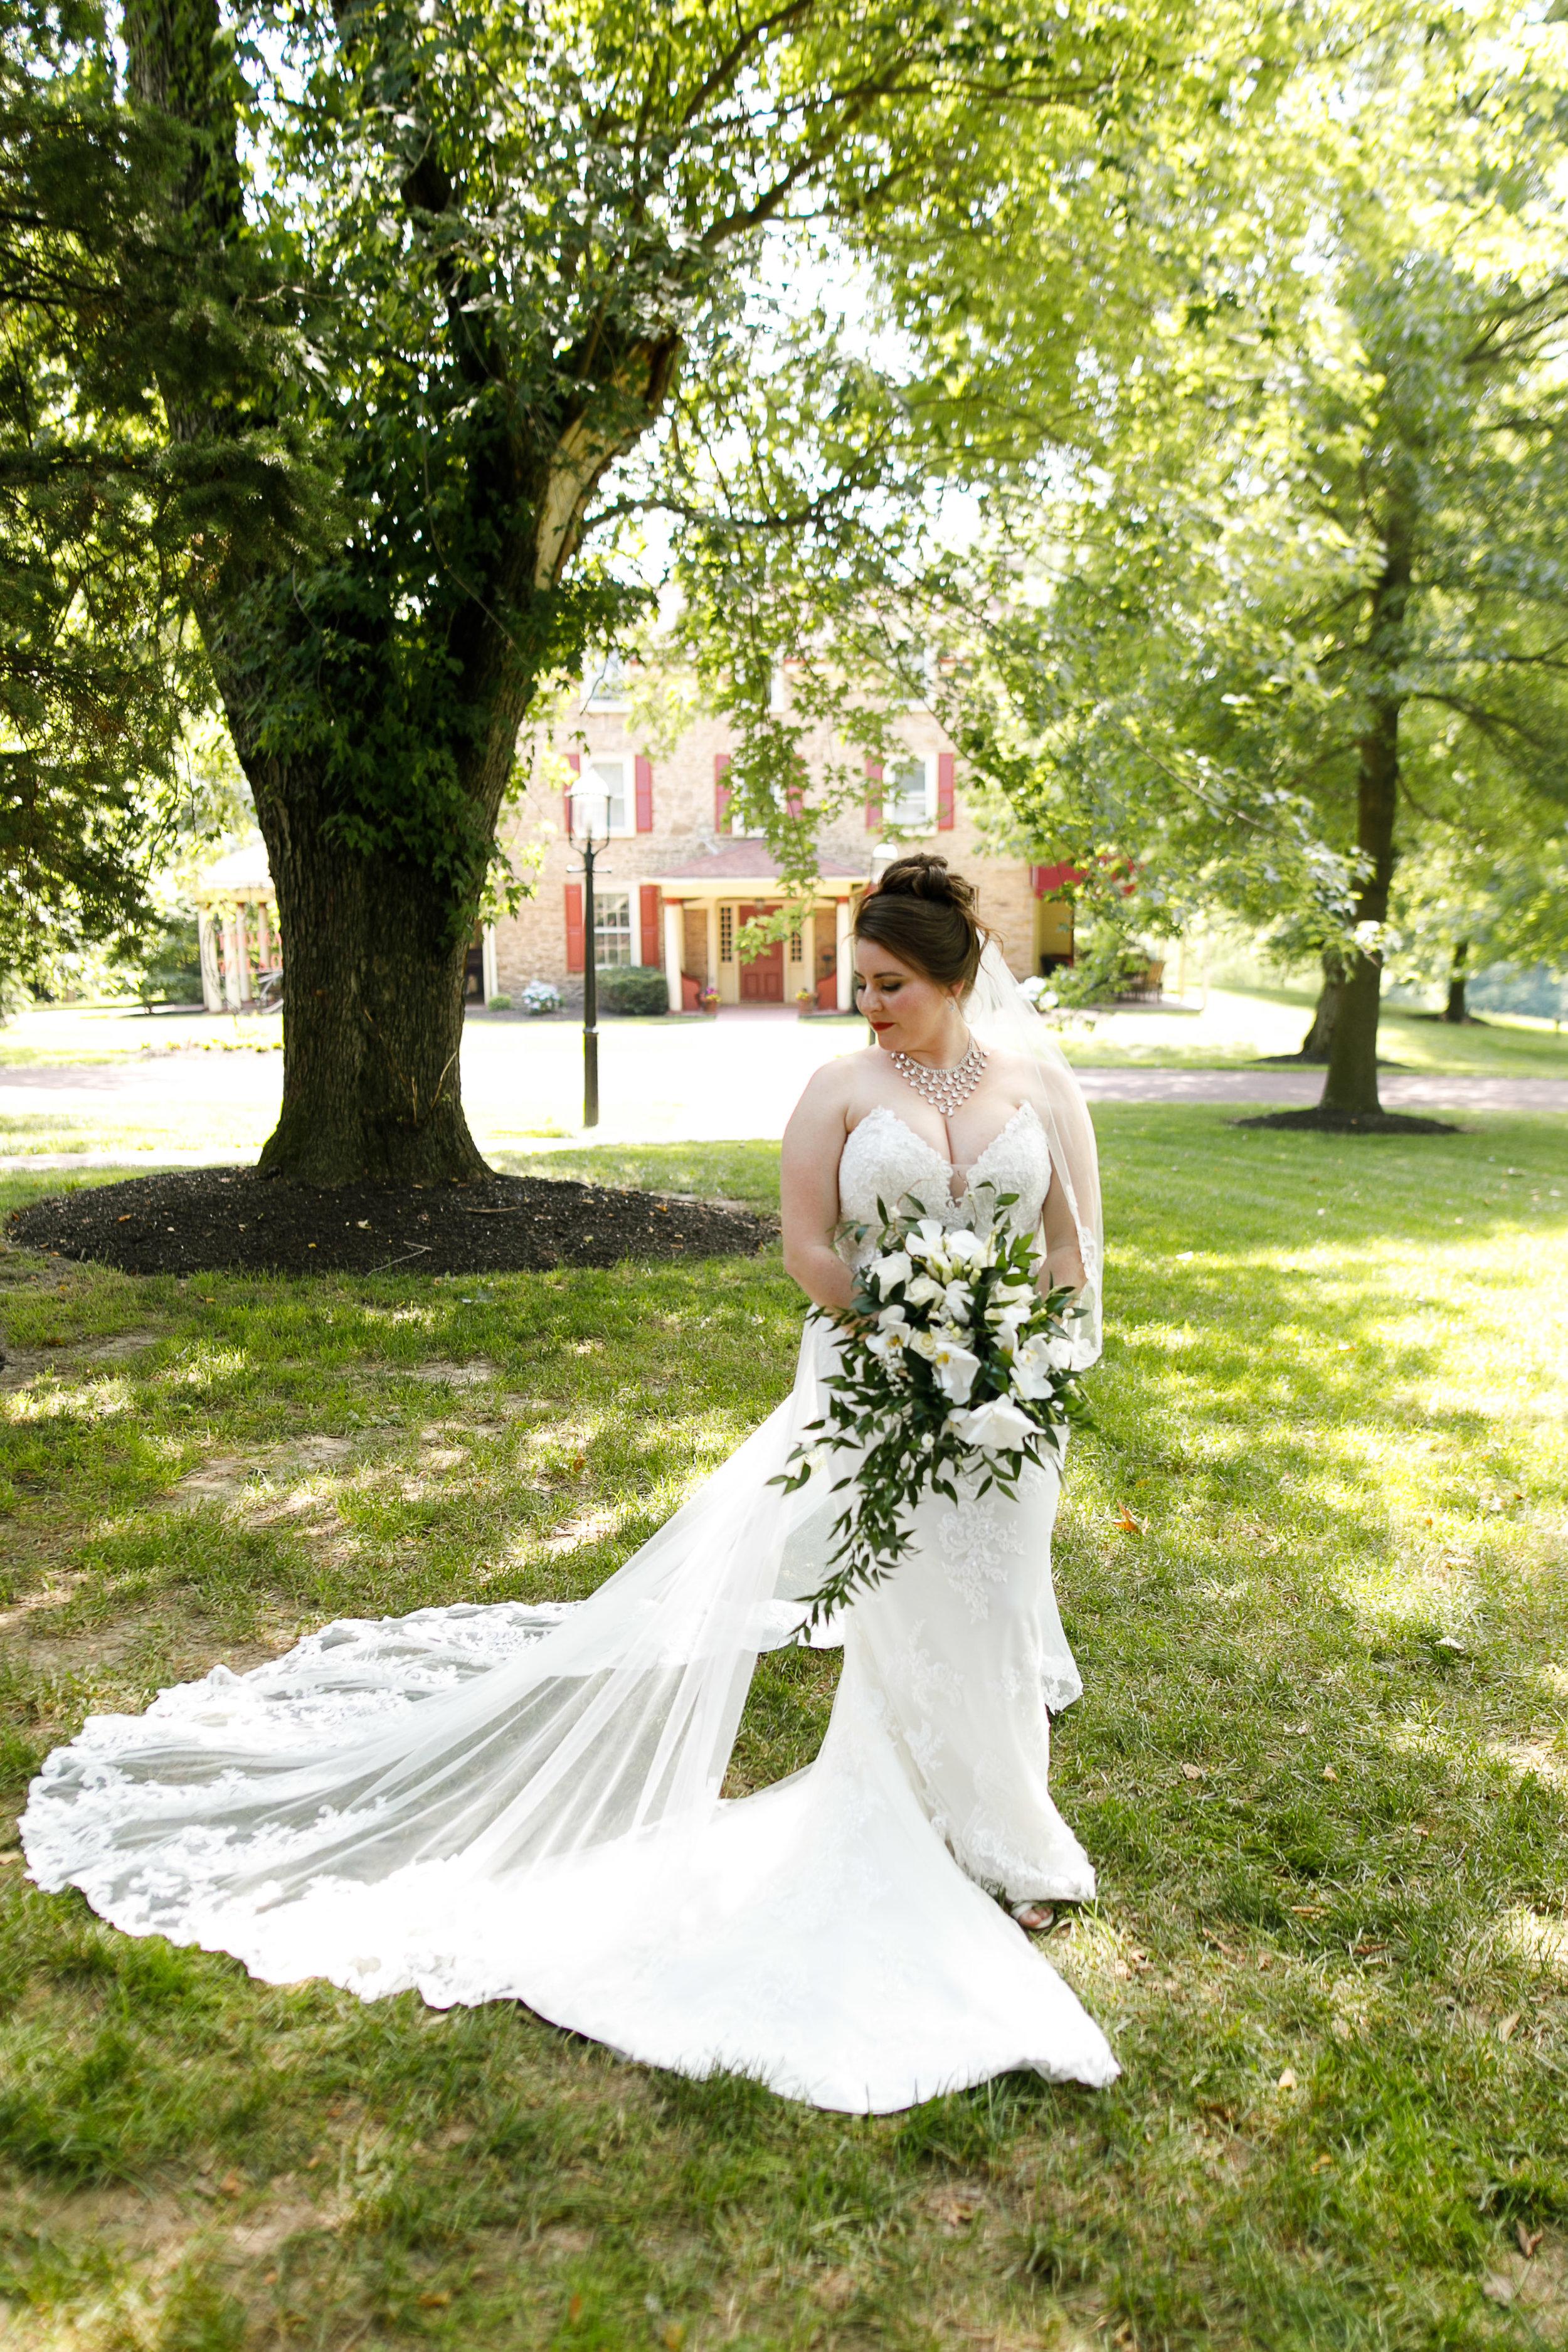 Wedding at Joseph Ambler In Bucks County PA34.jpg